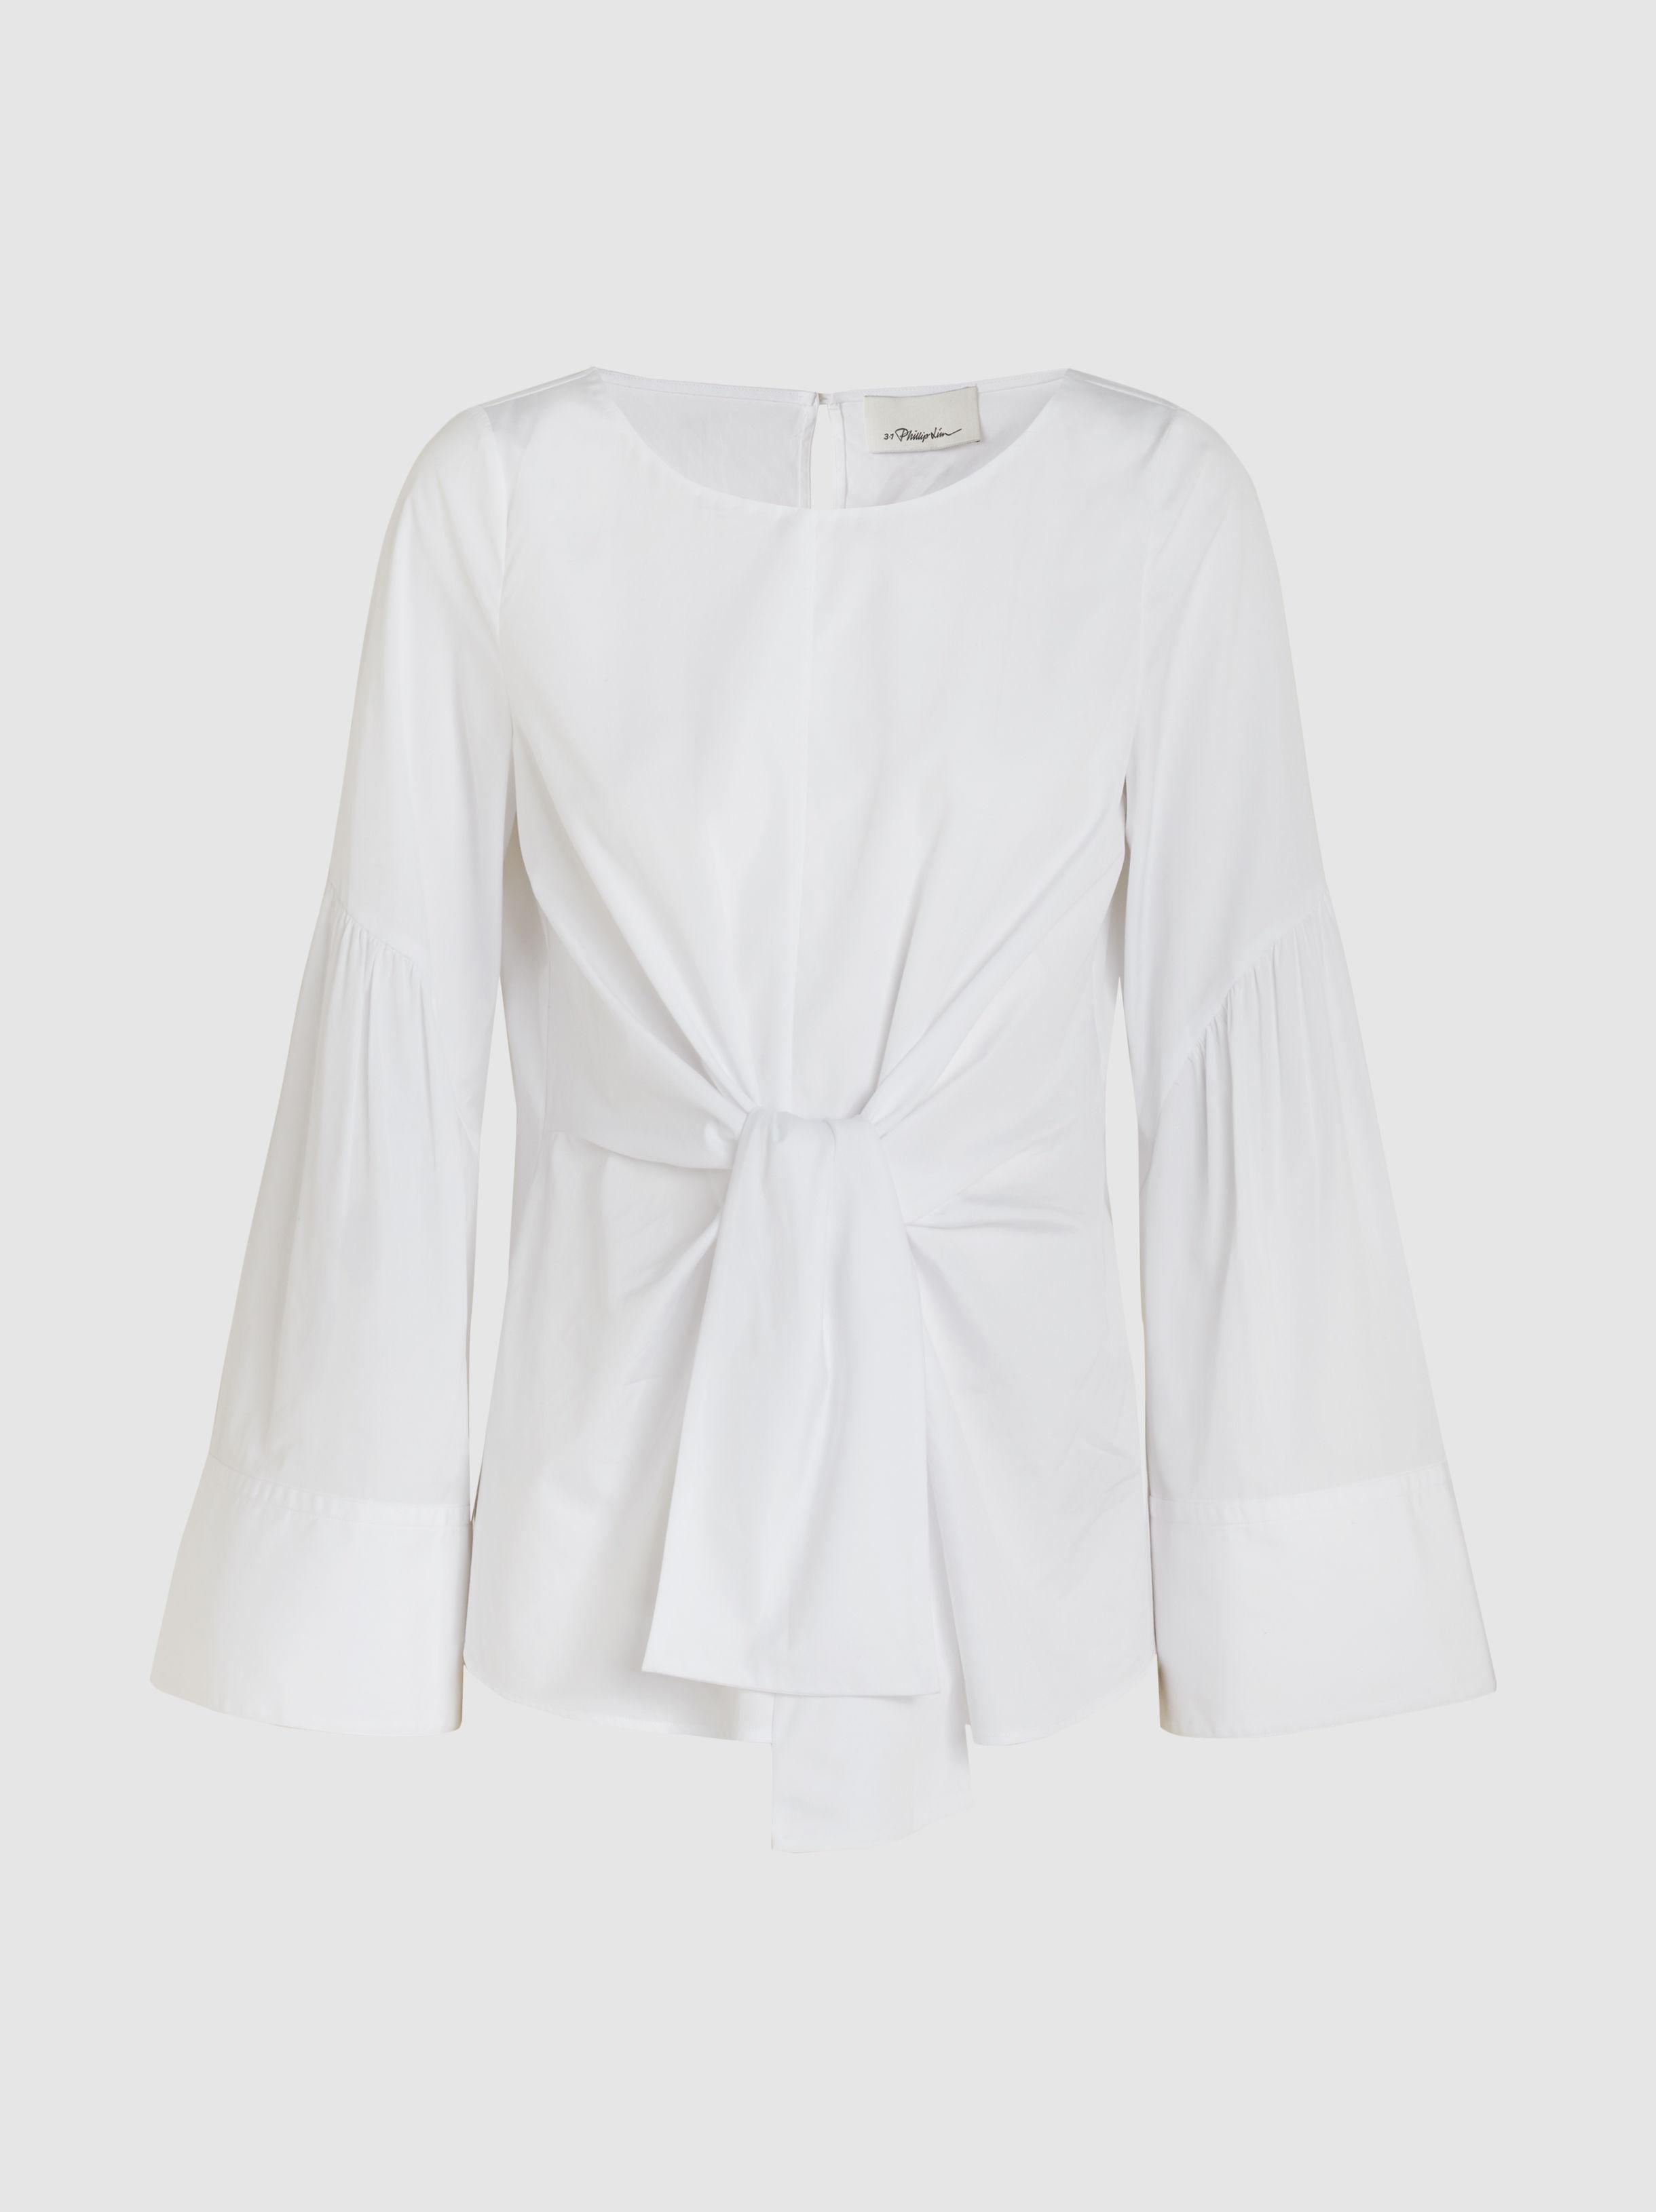 3.1 Phillip Lim Woman Embroidered Cotton-poplin Mini Dress Lilac Size 2 3.1 Phillip Lim Sale Sneakernews IbNnXA